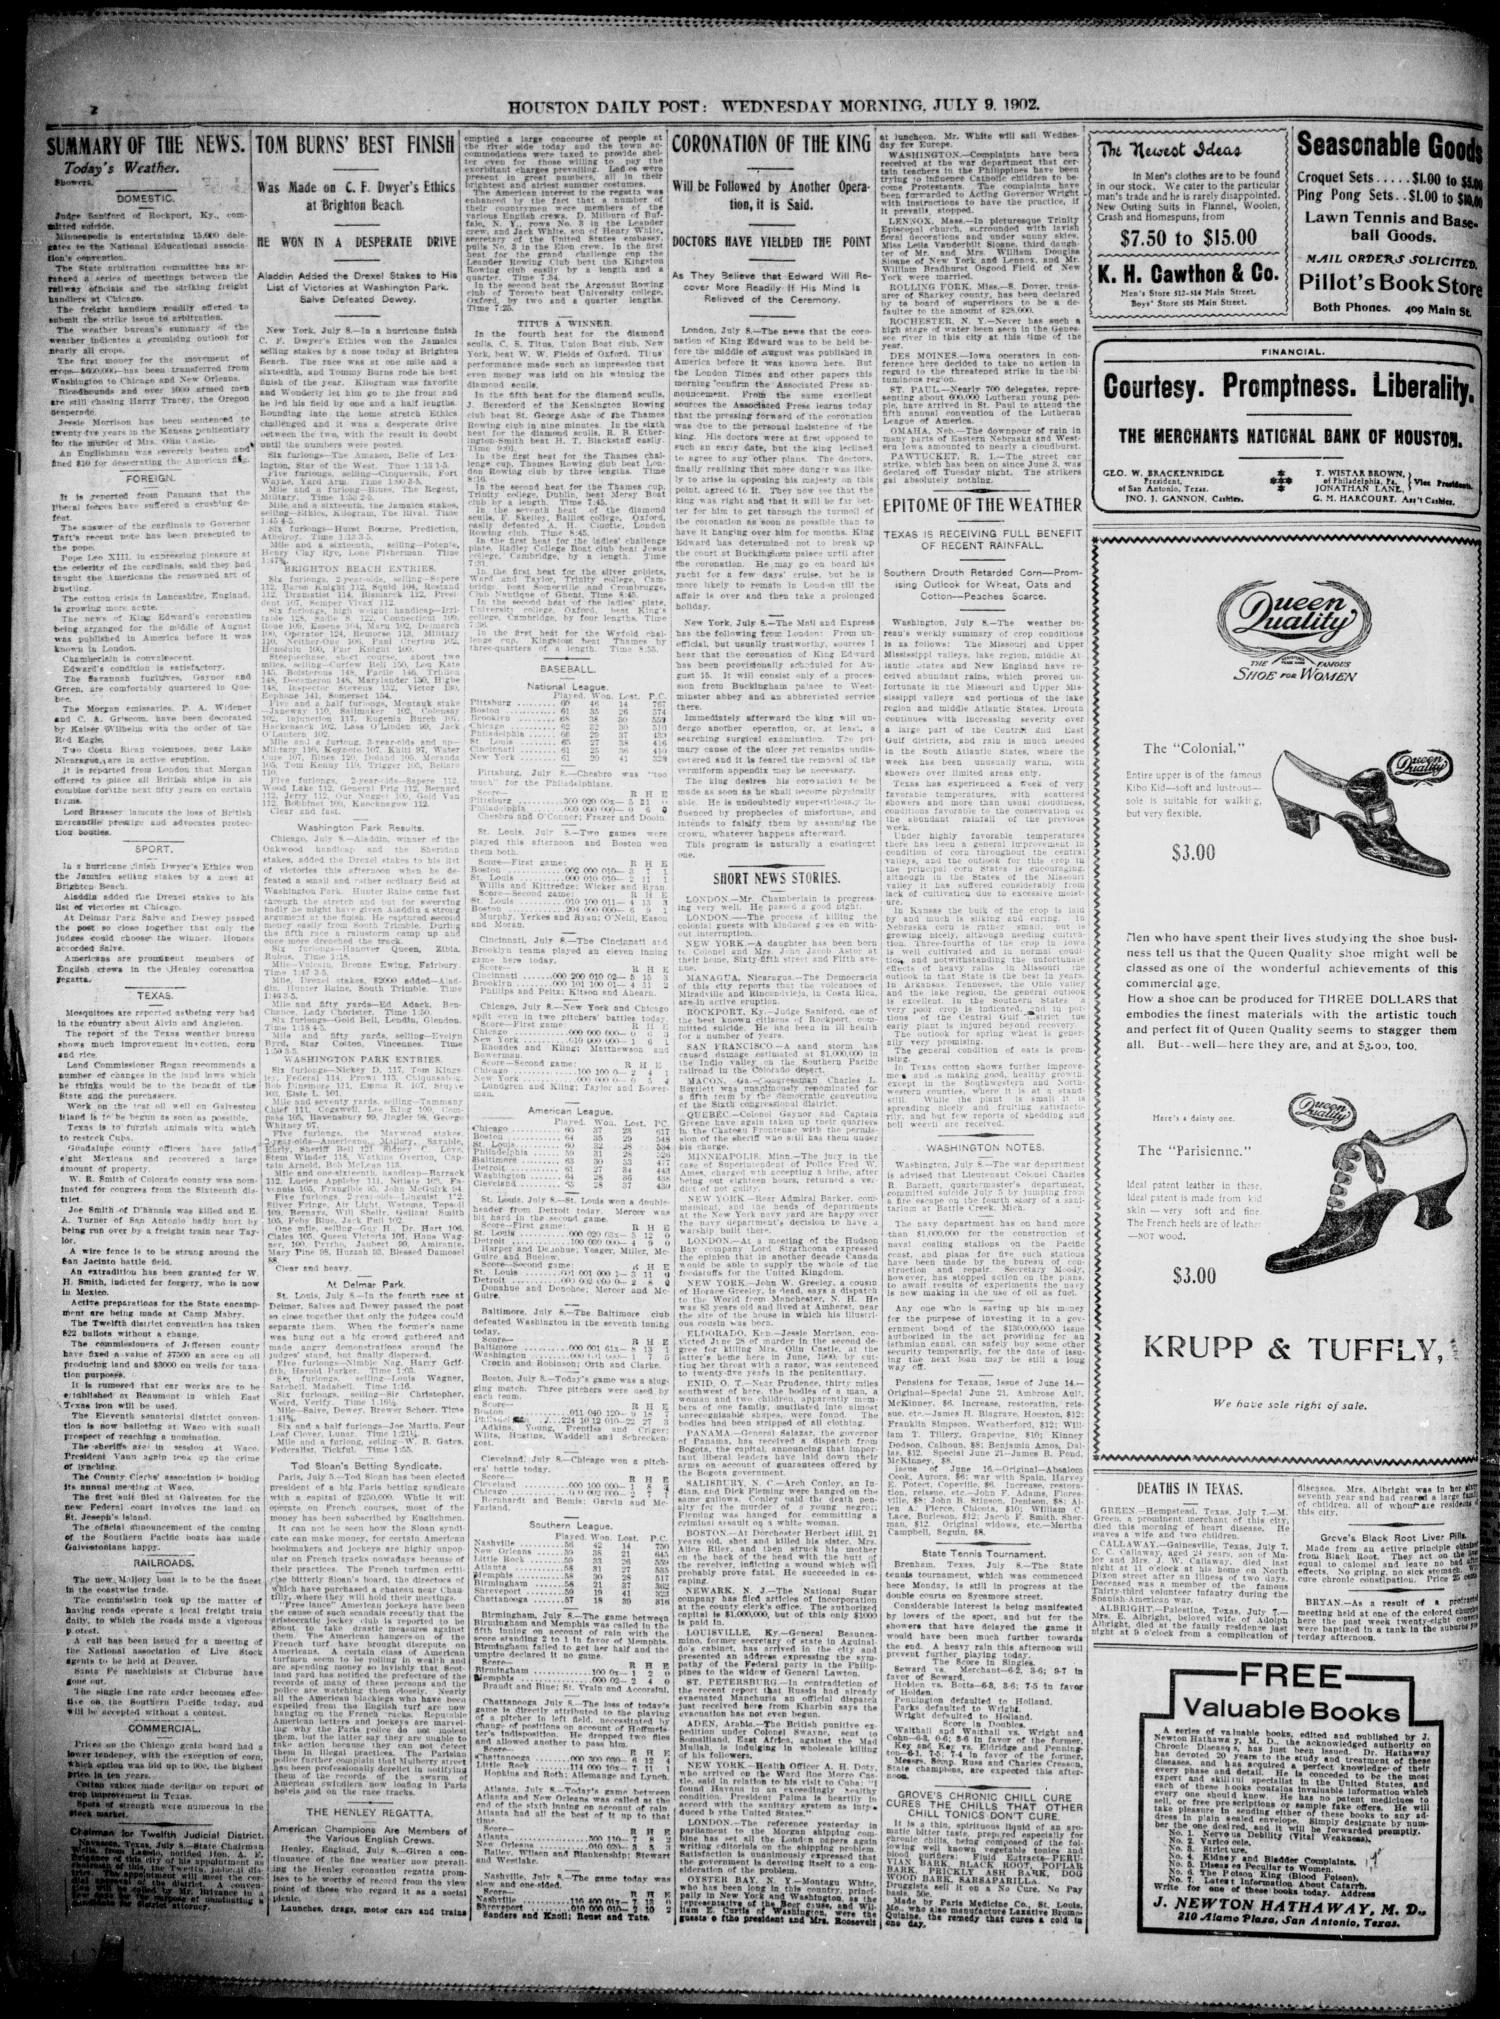 The Houston Daily Post (Houston, Tex ), Vol  XVIIITH YEAR